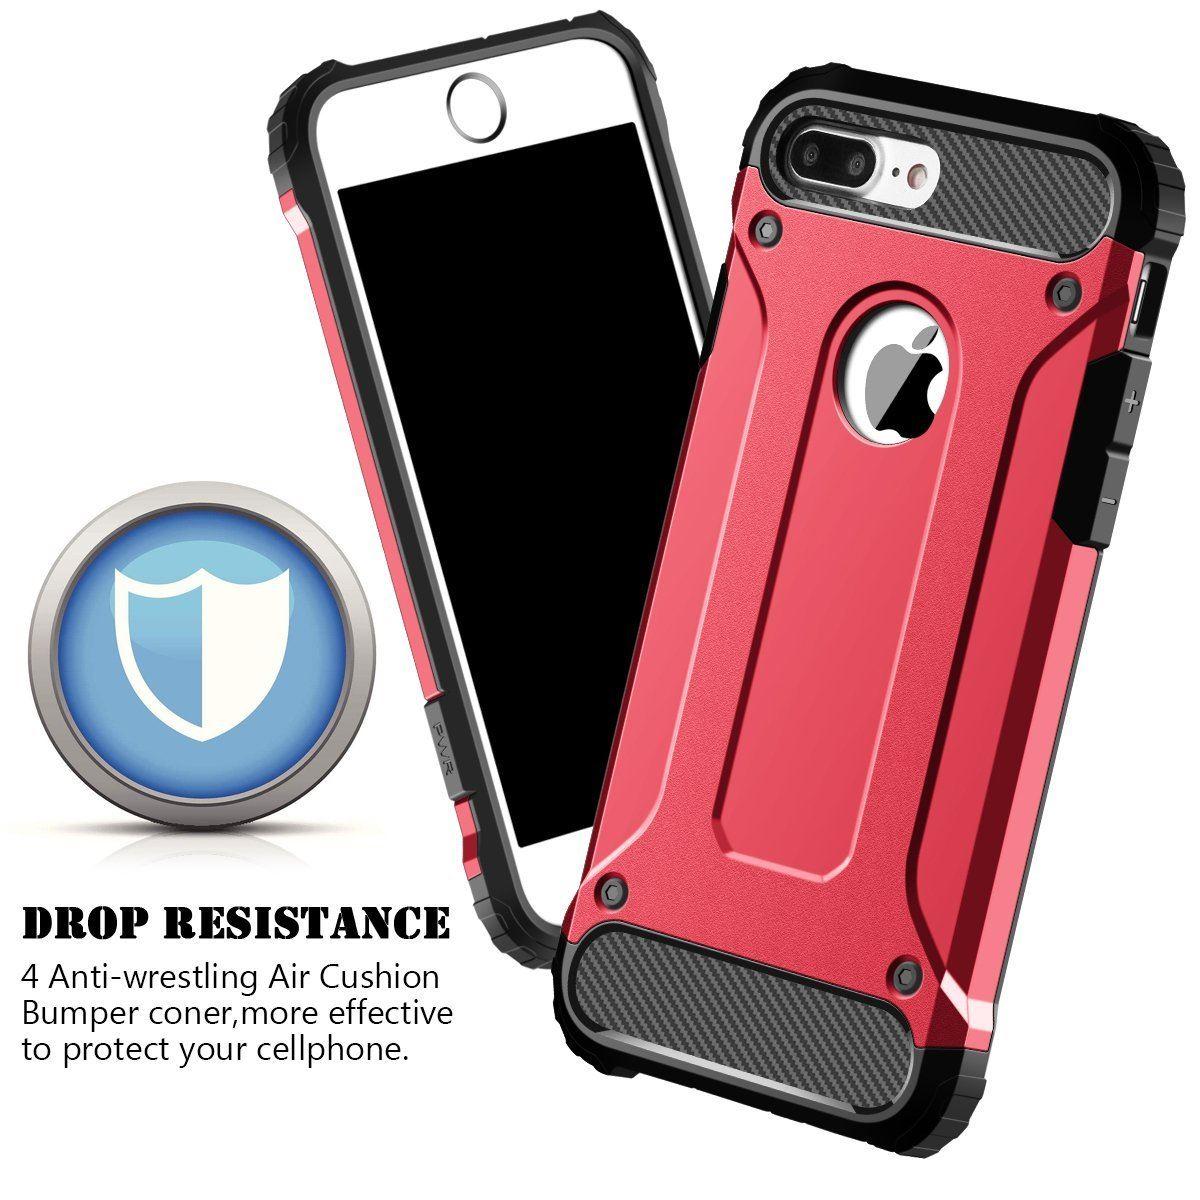 thumbnail 45 - For Apple iPhone 11 Pro Max XR Xs X 8 7 Plus 6 5 Se Case Cover Tough Armor